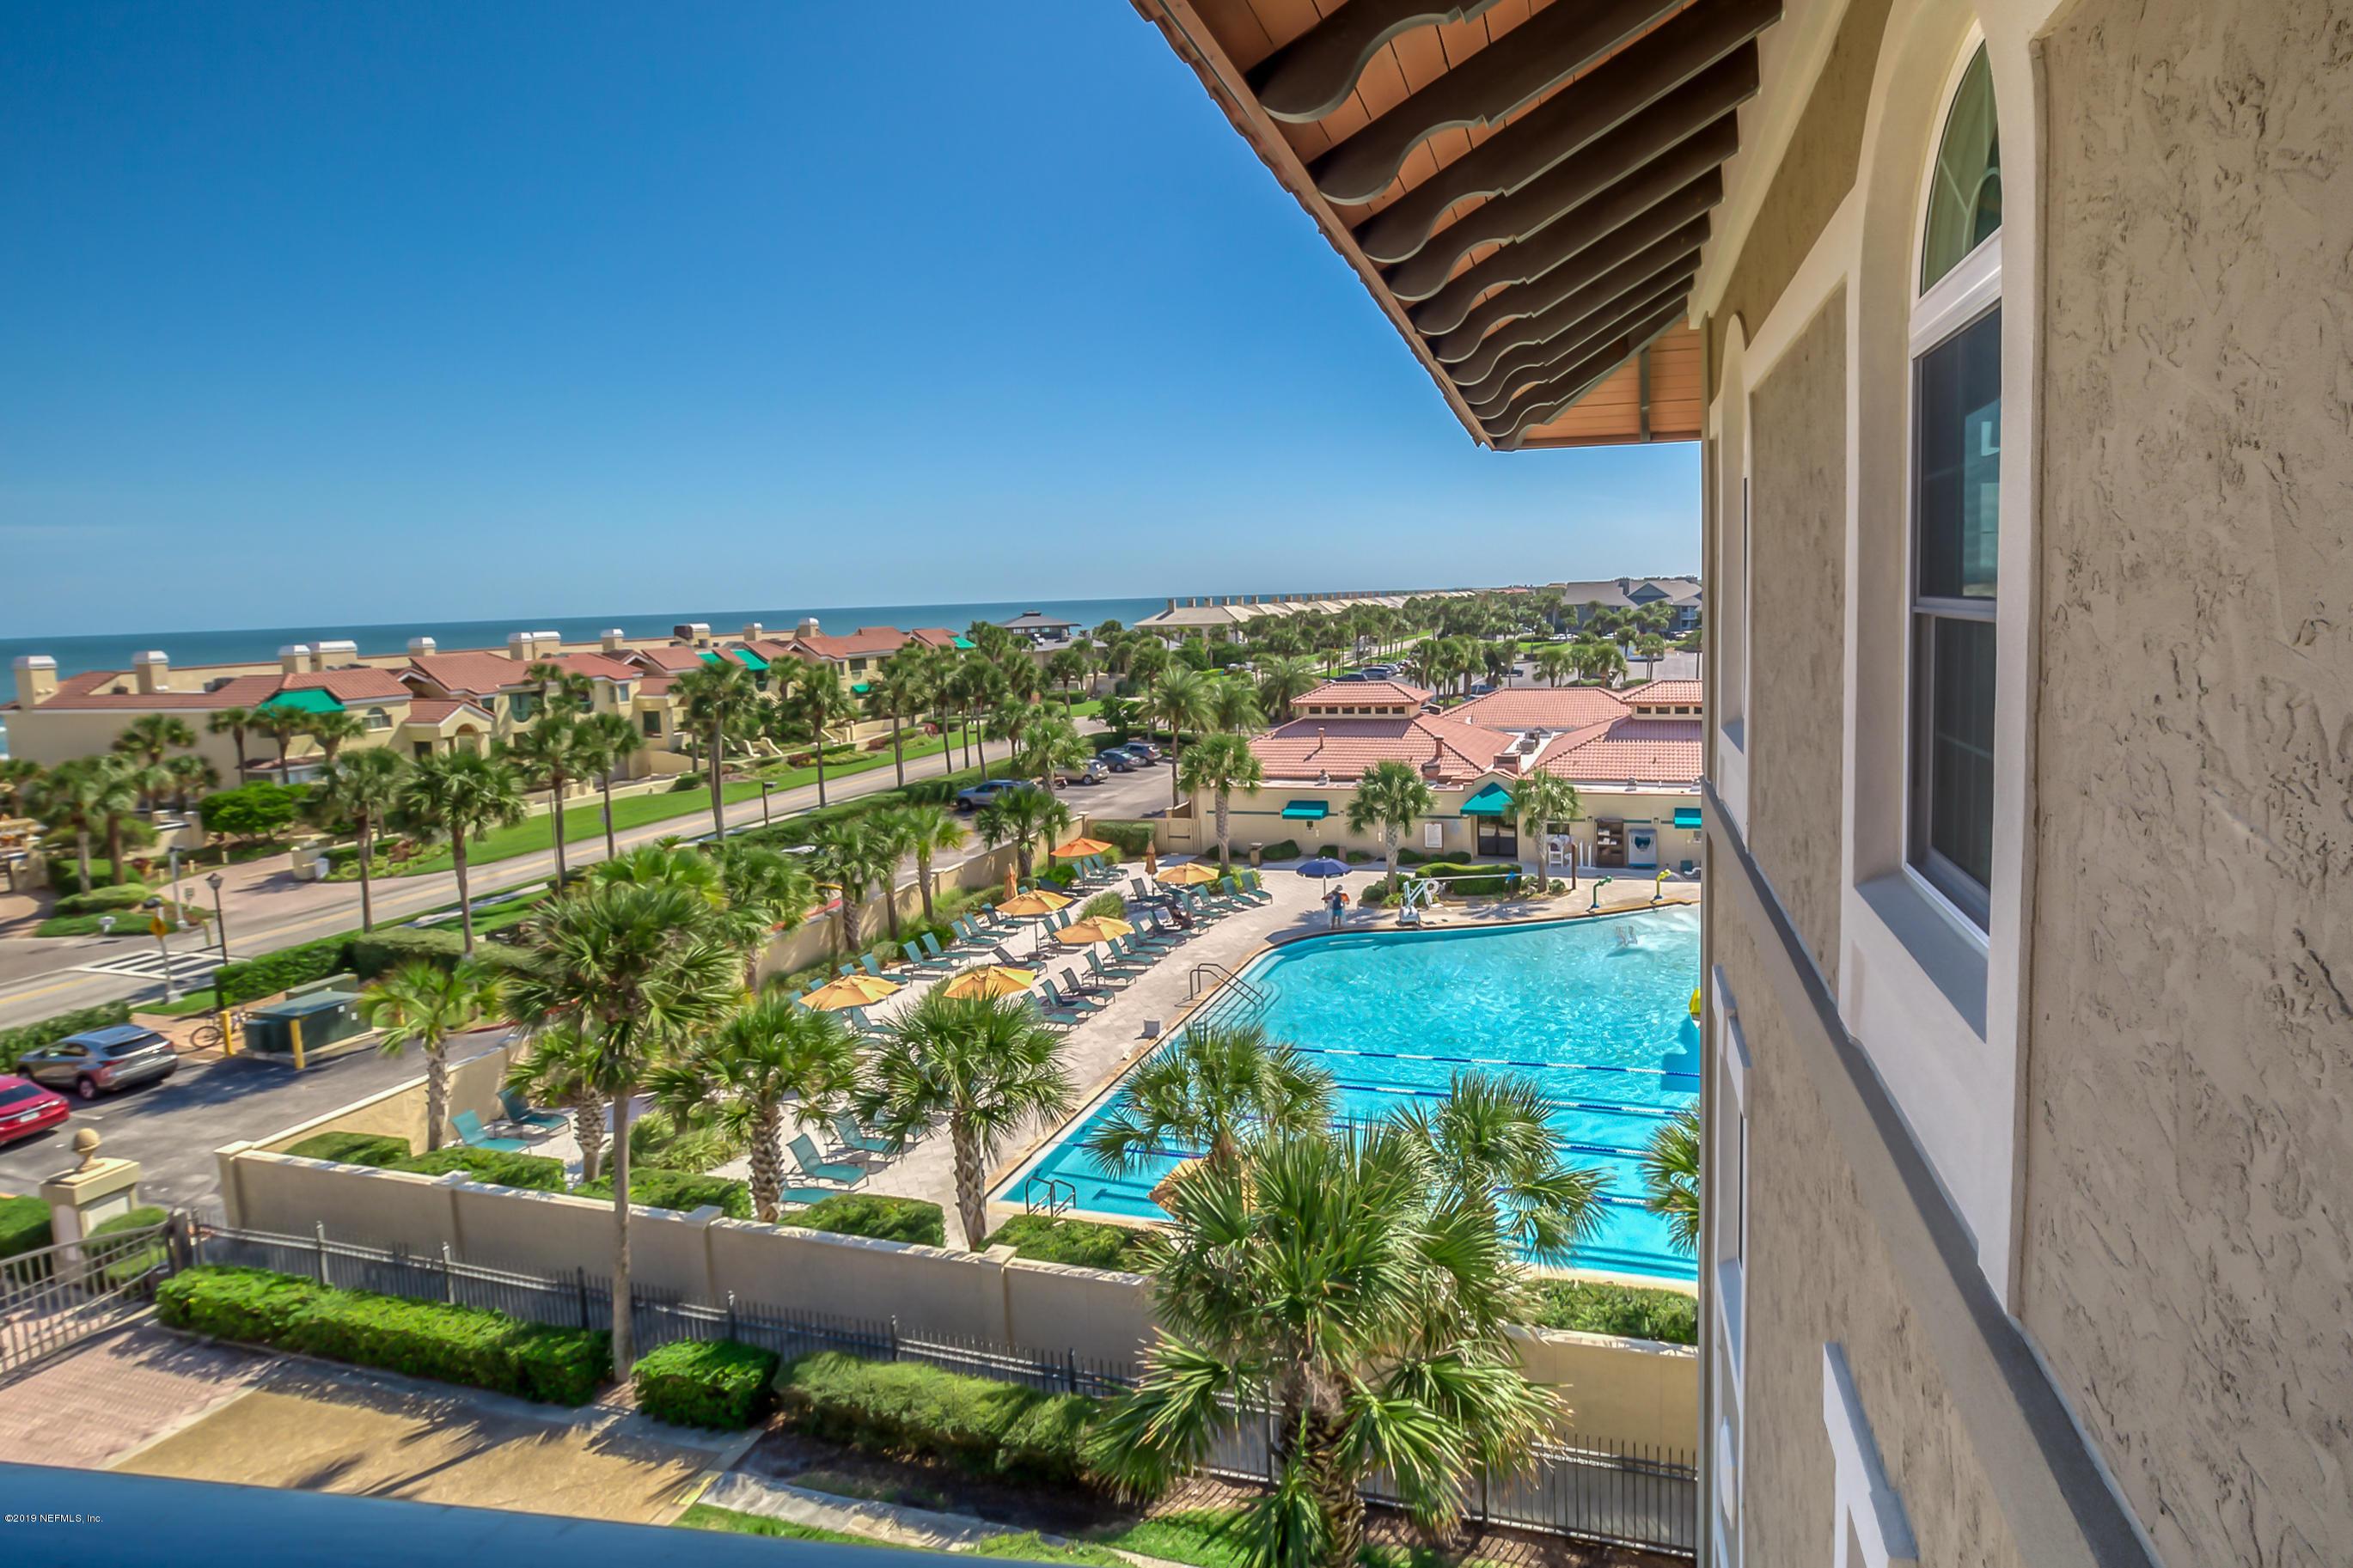 600 PONTE VEDRA, PONTE VEDRA BEACH, FLORIDA 32082, 2 Bedrooms Bedrooms, ,2 BathroomsBathrooms,Condo,For sale,PONTE VEDRA,1021814